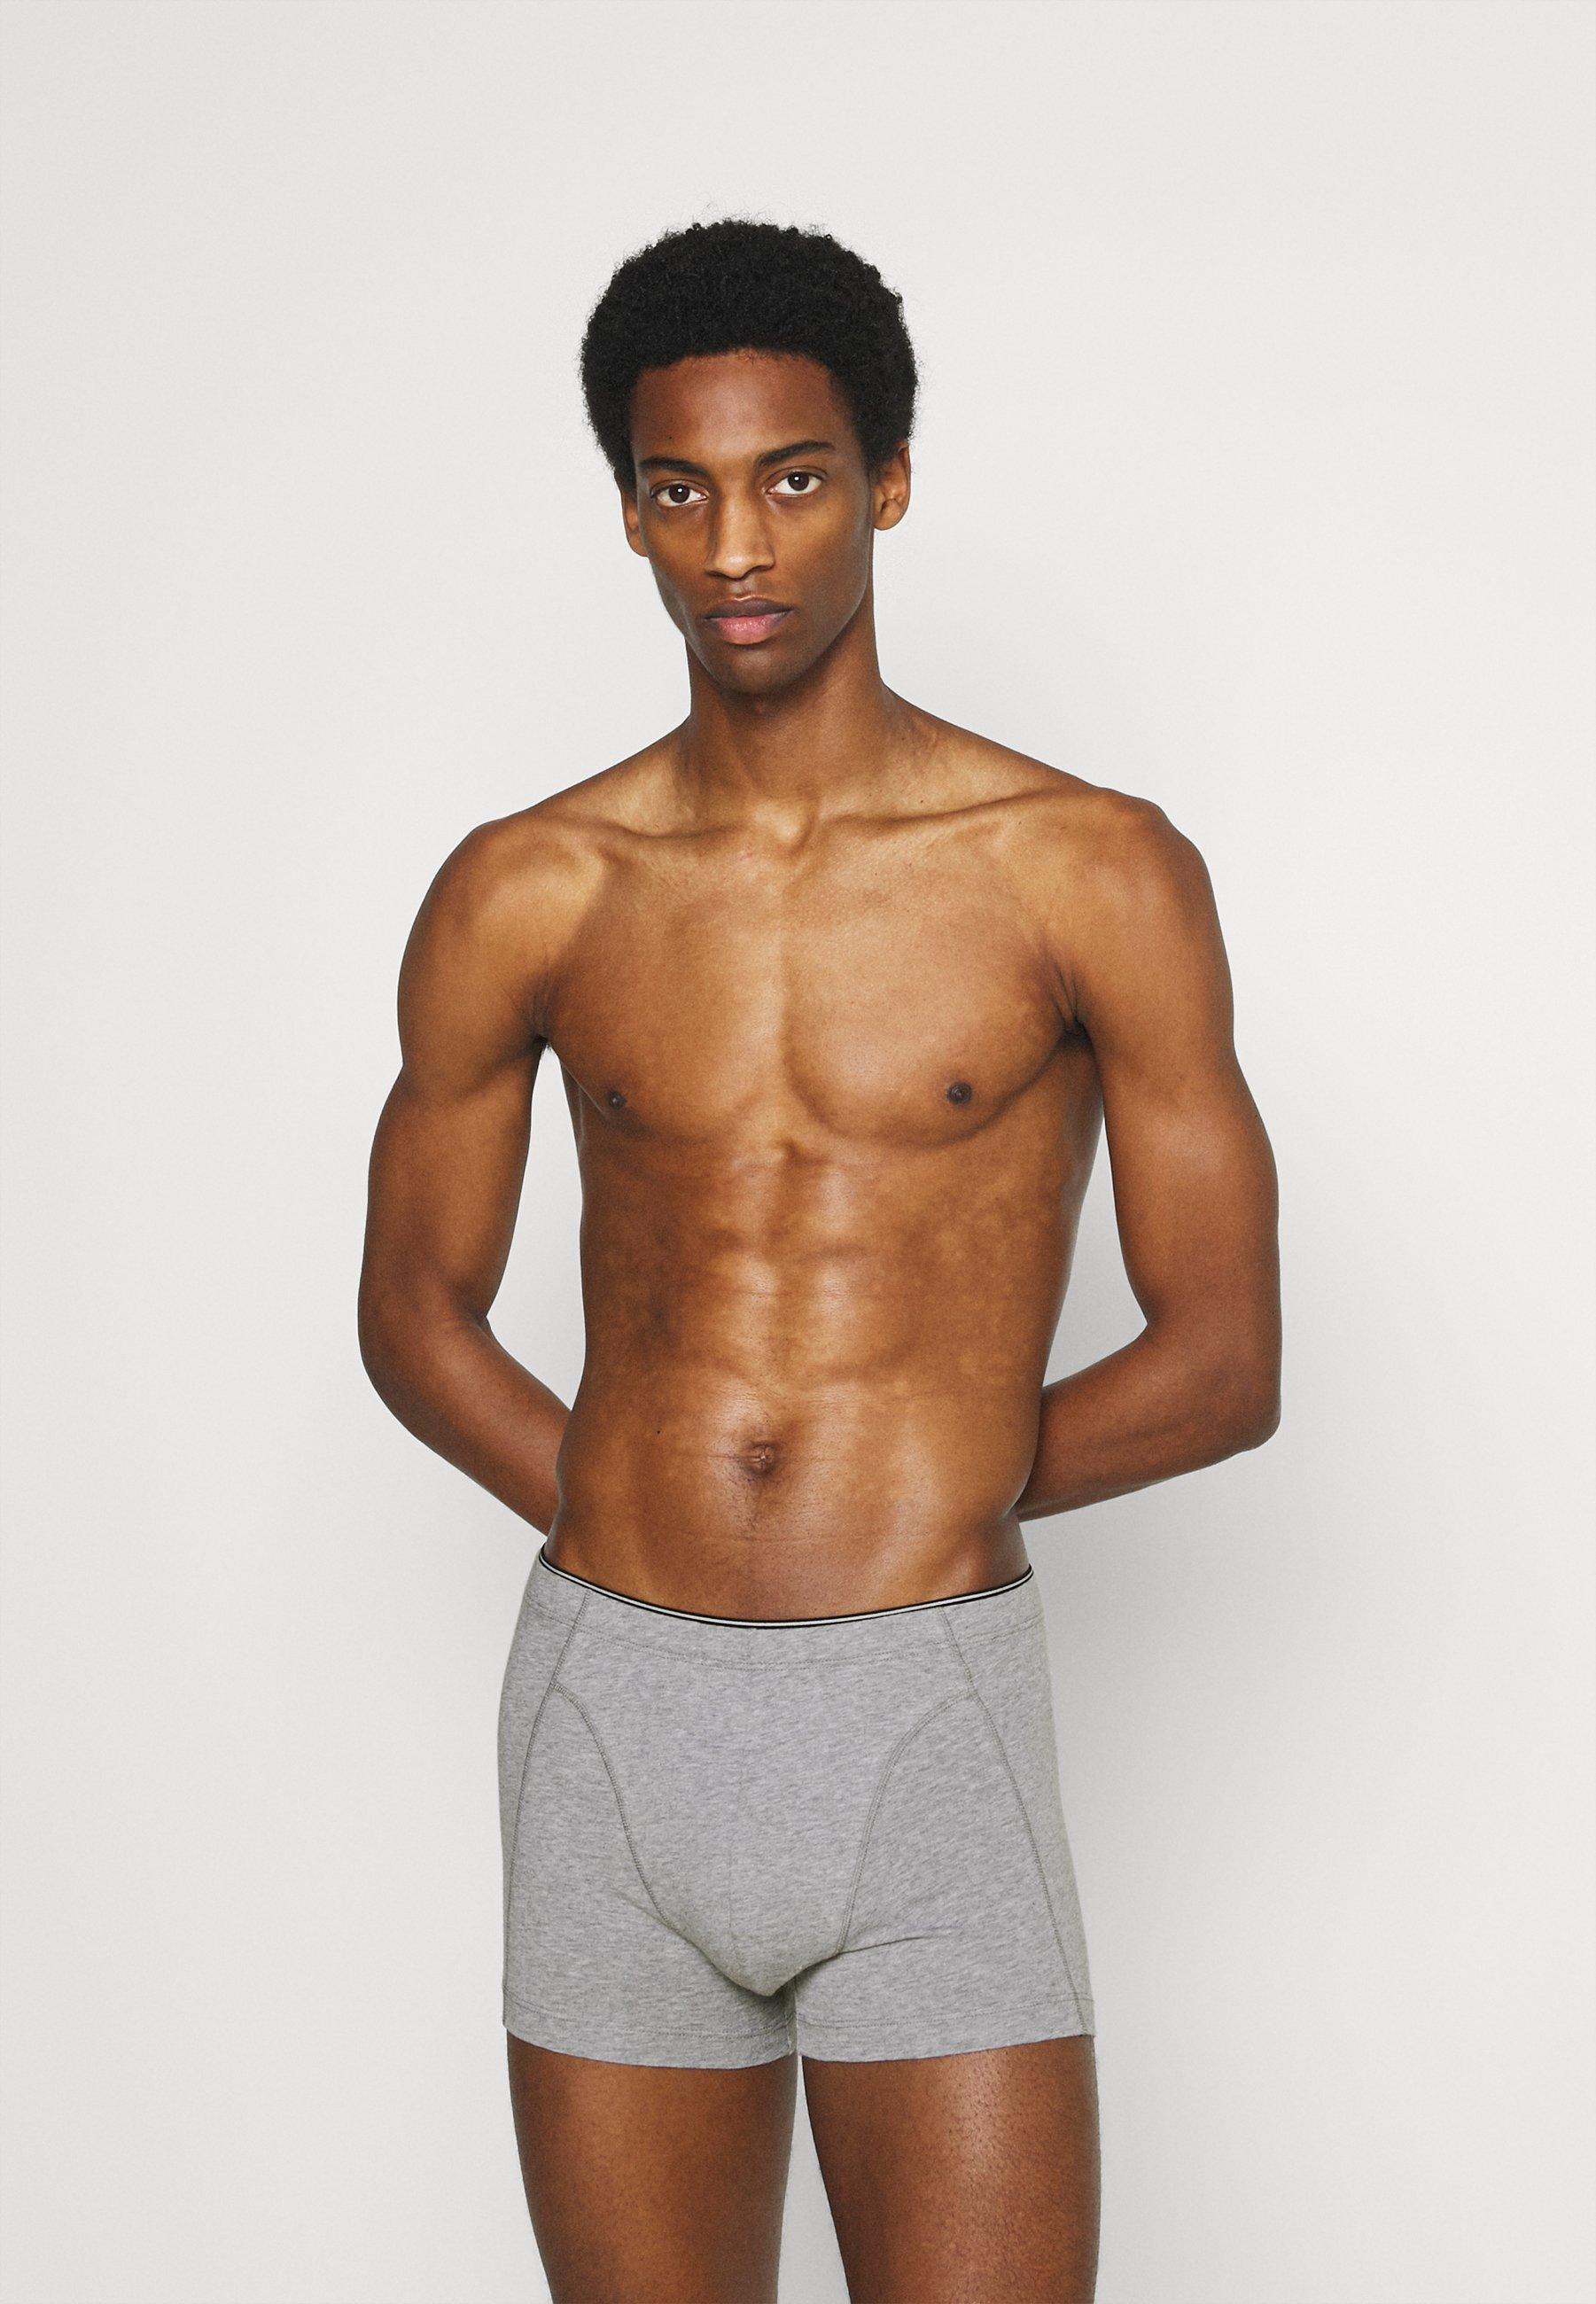 Herren Unterhose mit Bein Organic Cotton - 95/5 Original - Panties